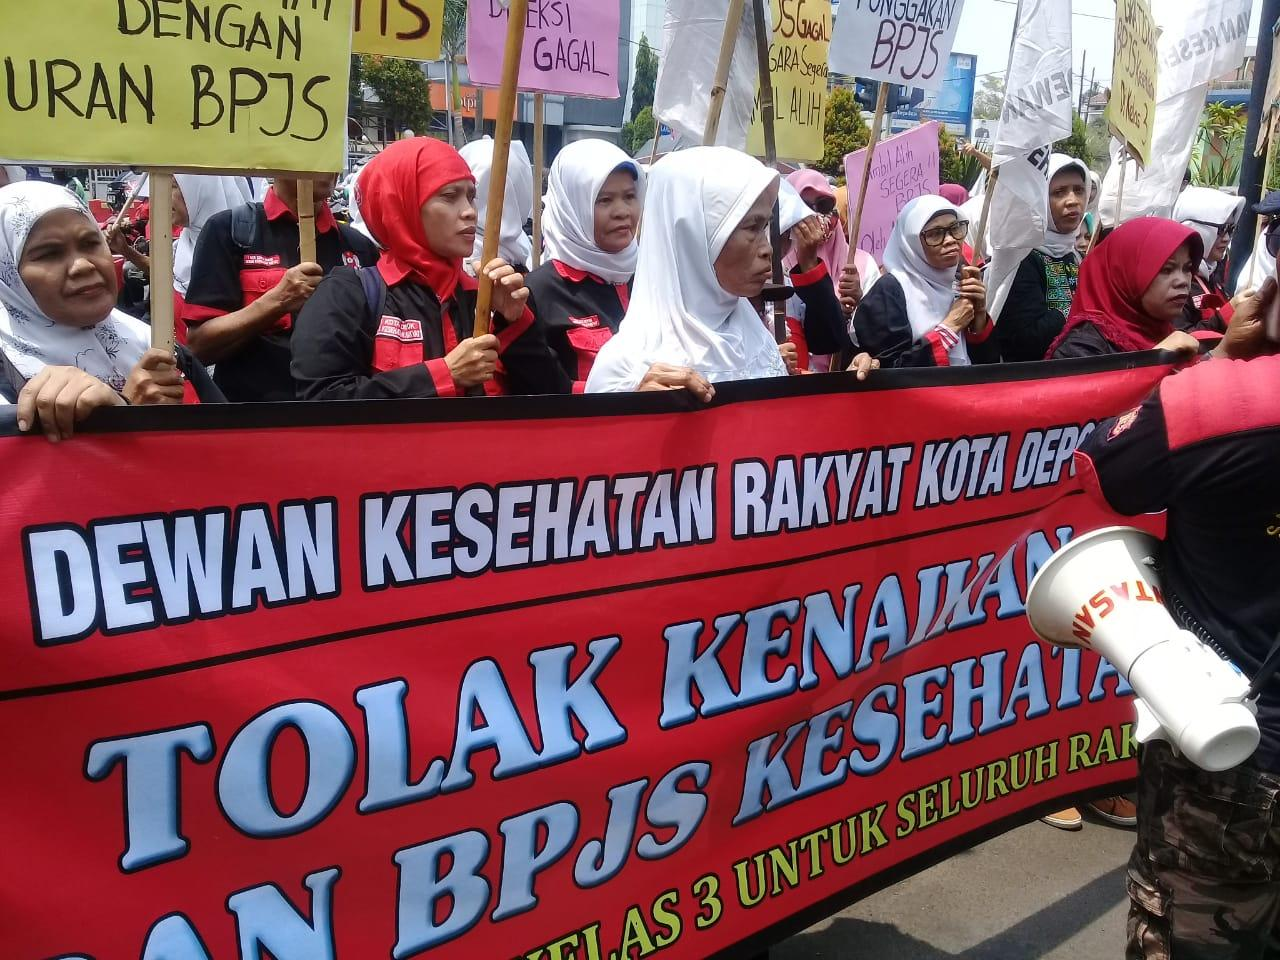 Datangi Kantor BPJS, DKR: Tolak Kenaikan Iuran, Kembalikan Jamkesmas